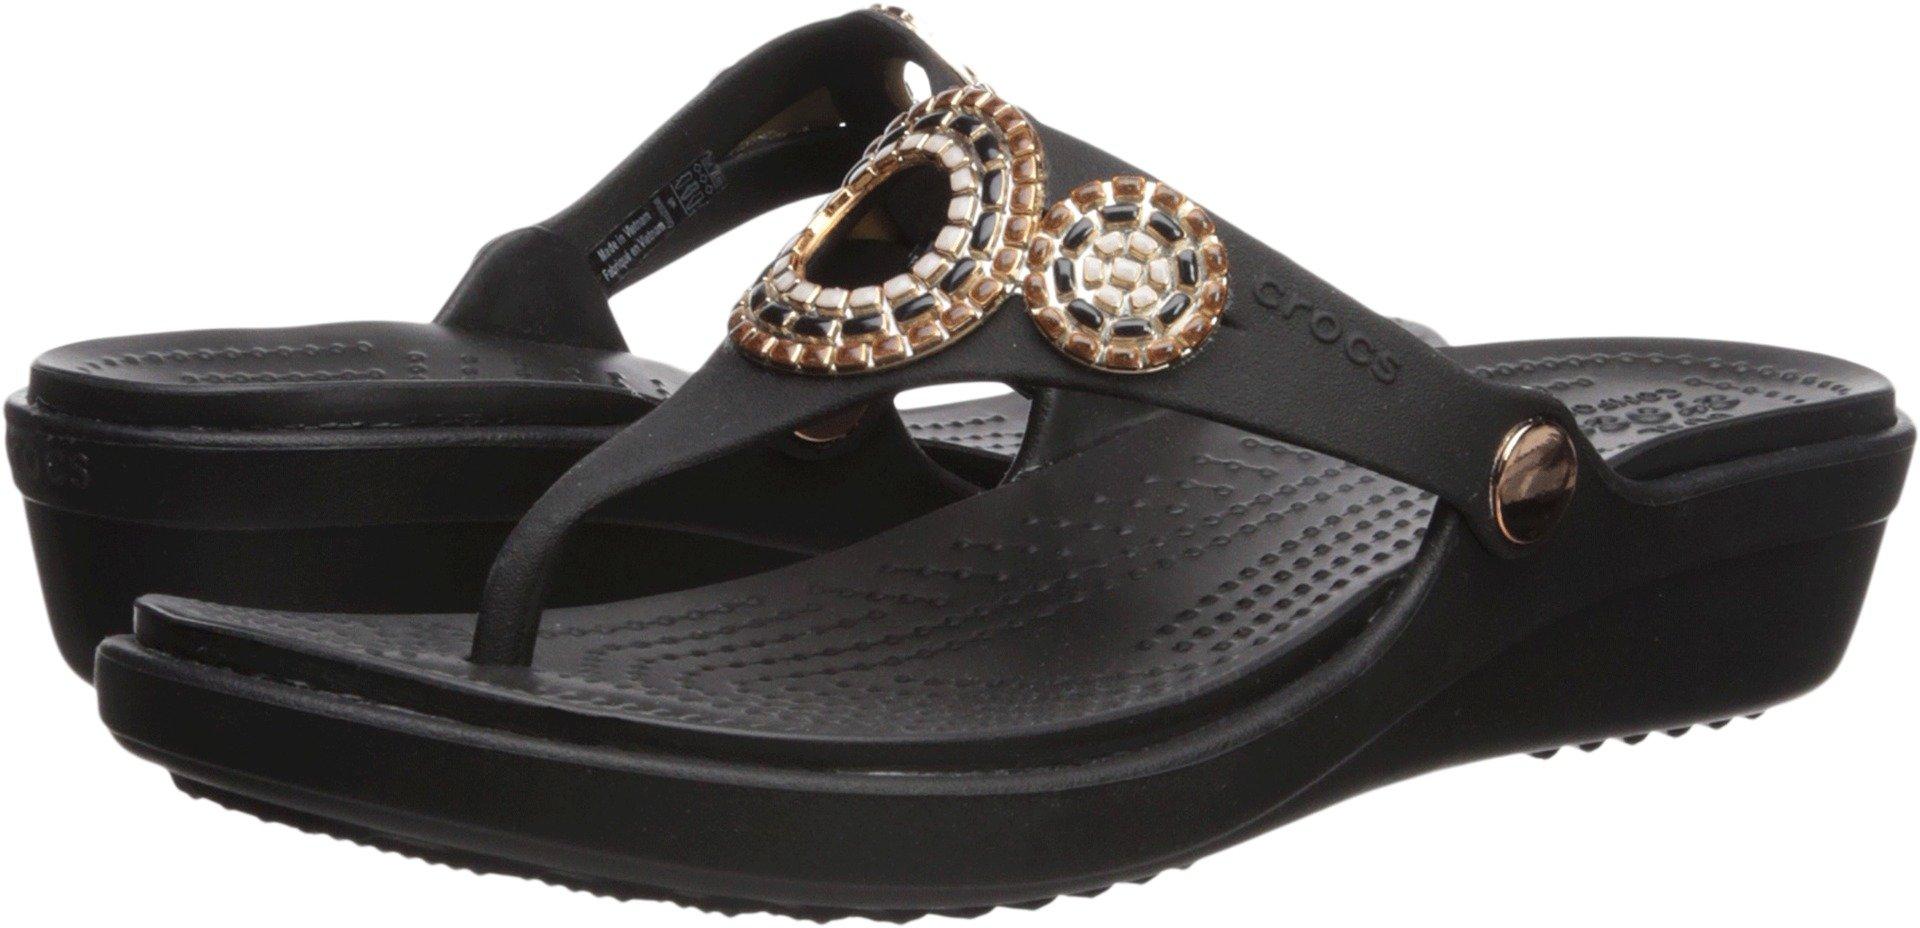 Crocs Women's Sanrah Diamante Wedge Flip W Sandal, Black/Rose Gold, 9 M US